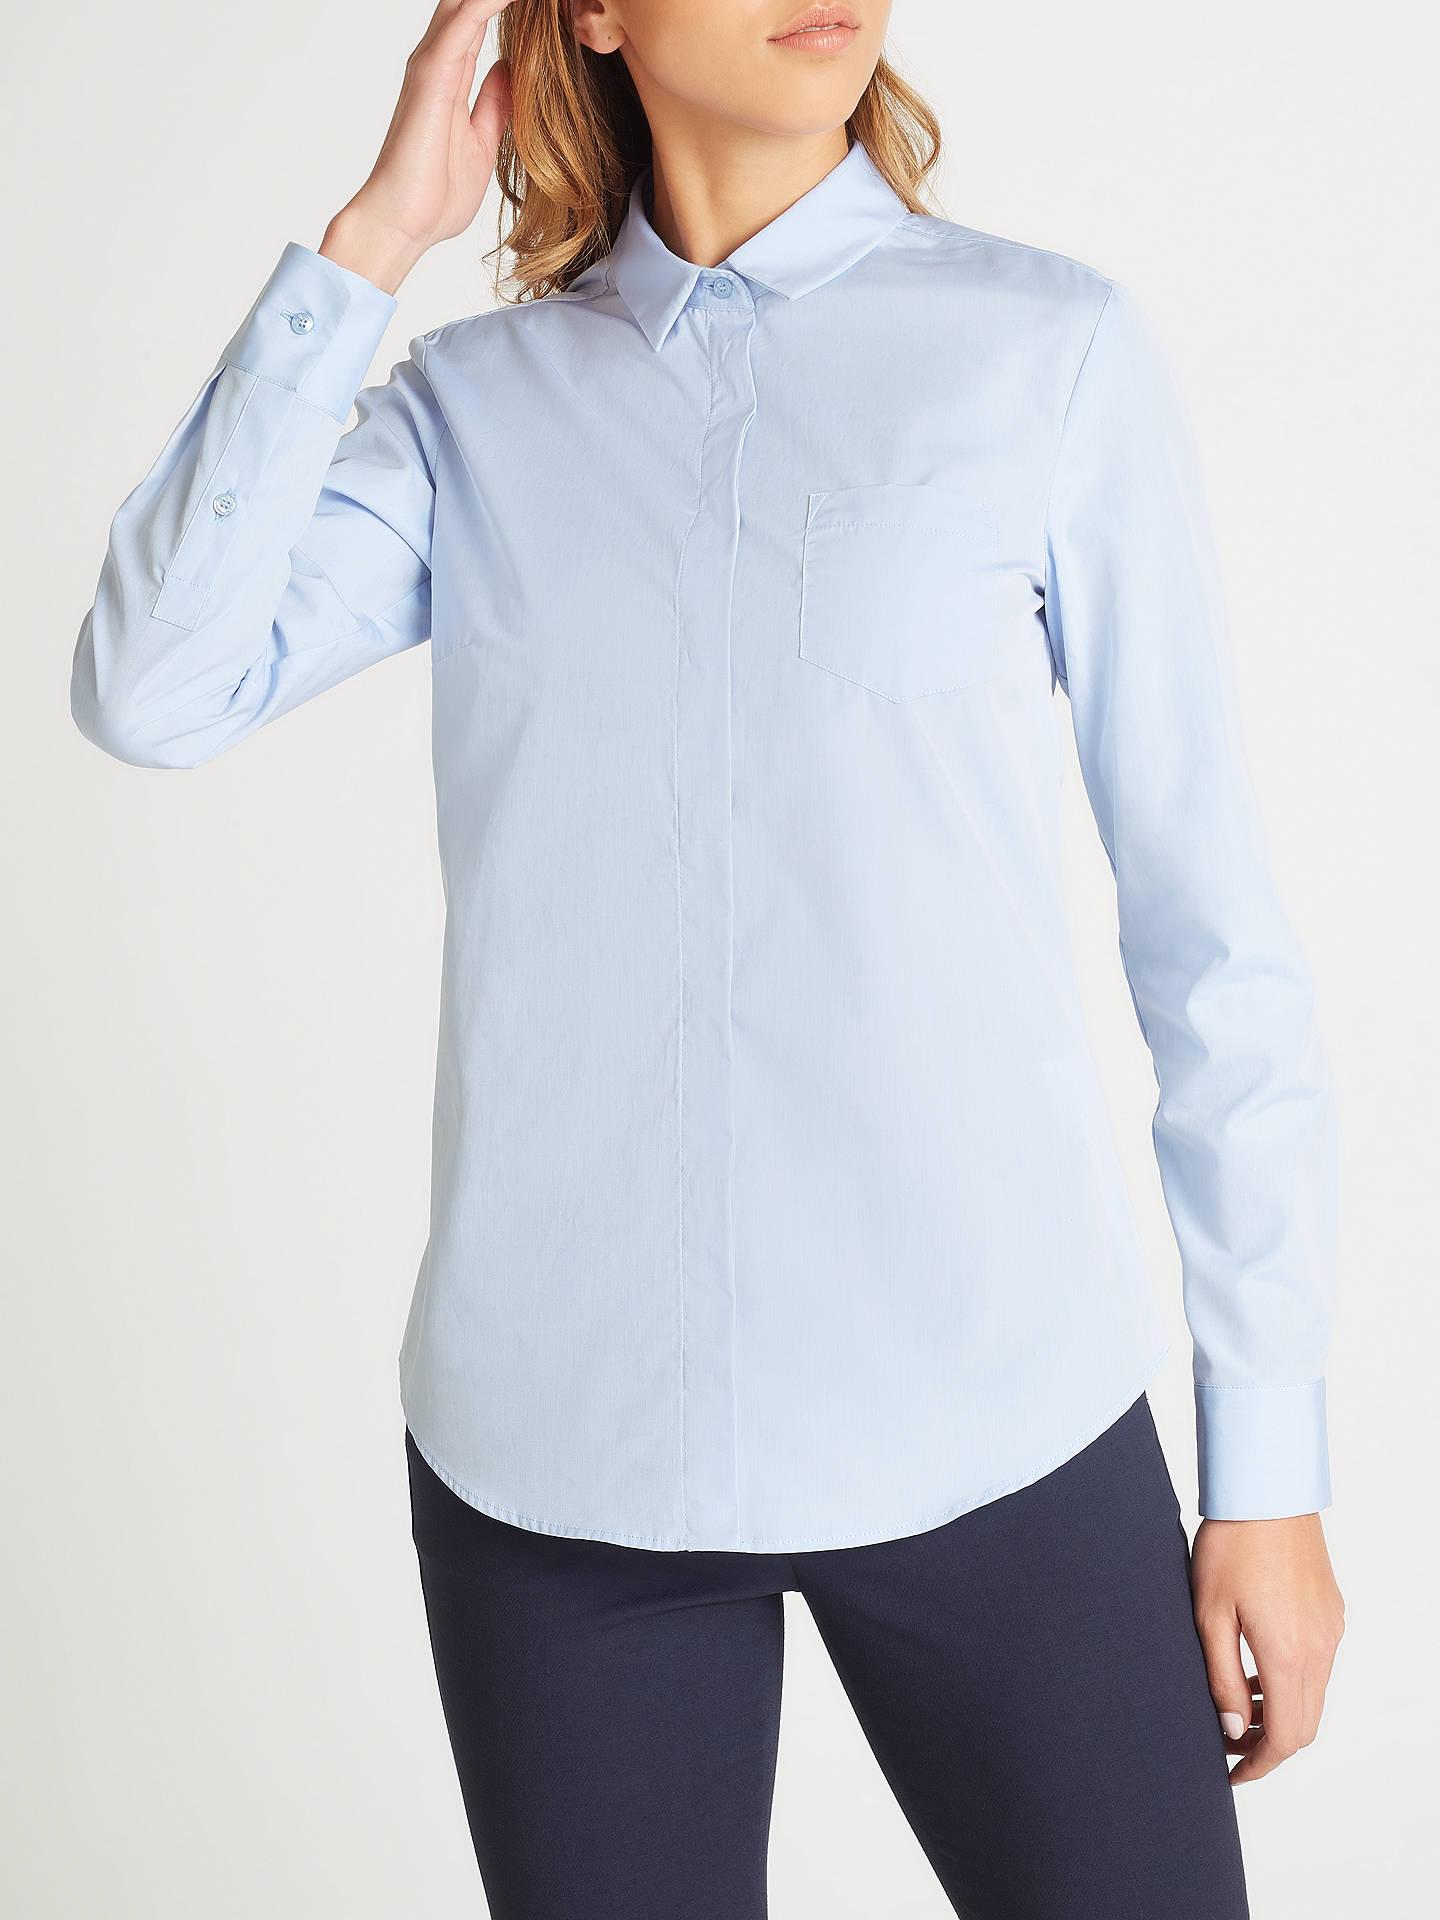 d2c15baa Buy Weekend MaxMara Raggio Cotton Poplin Shirt, Light Blue, 8 Online at  johnlewis.